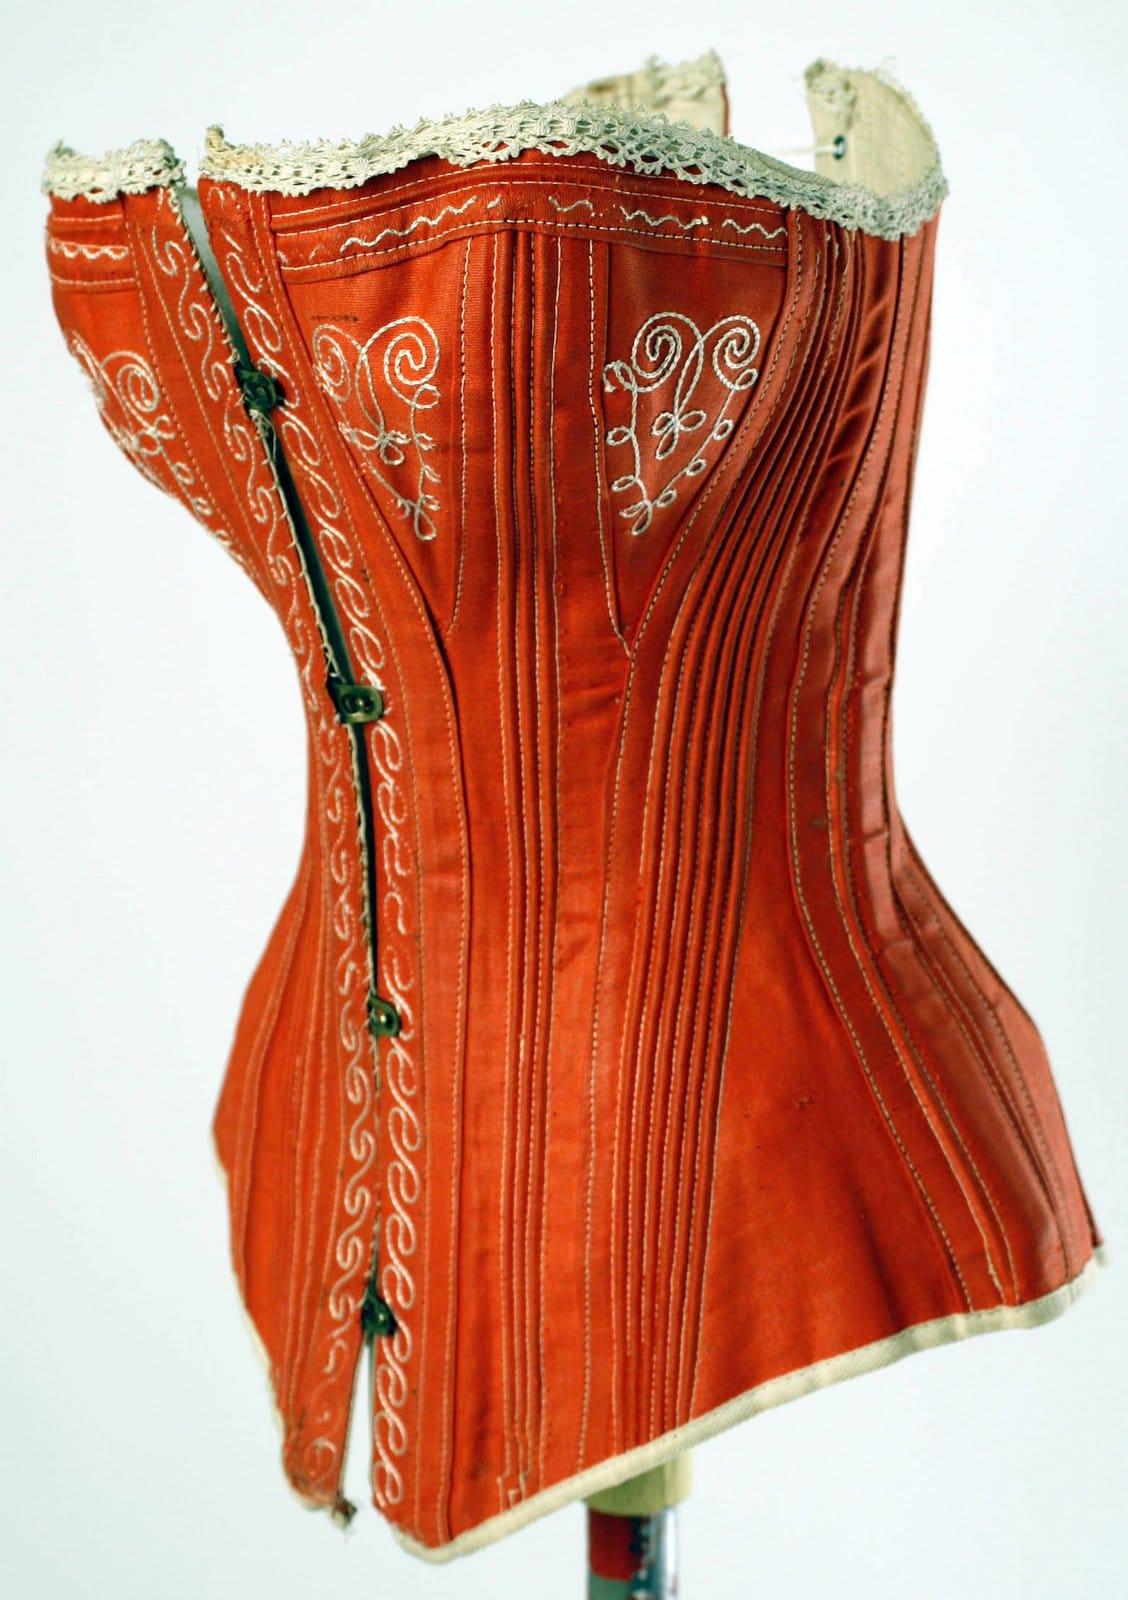 Red vintage corset - American design - 1880s